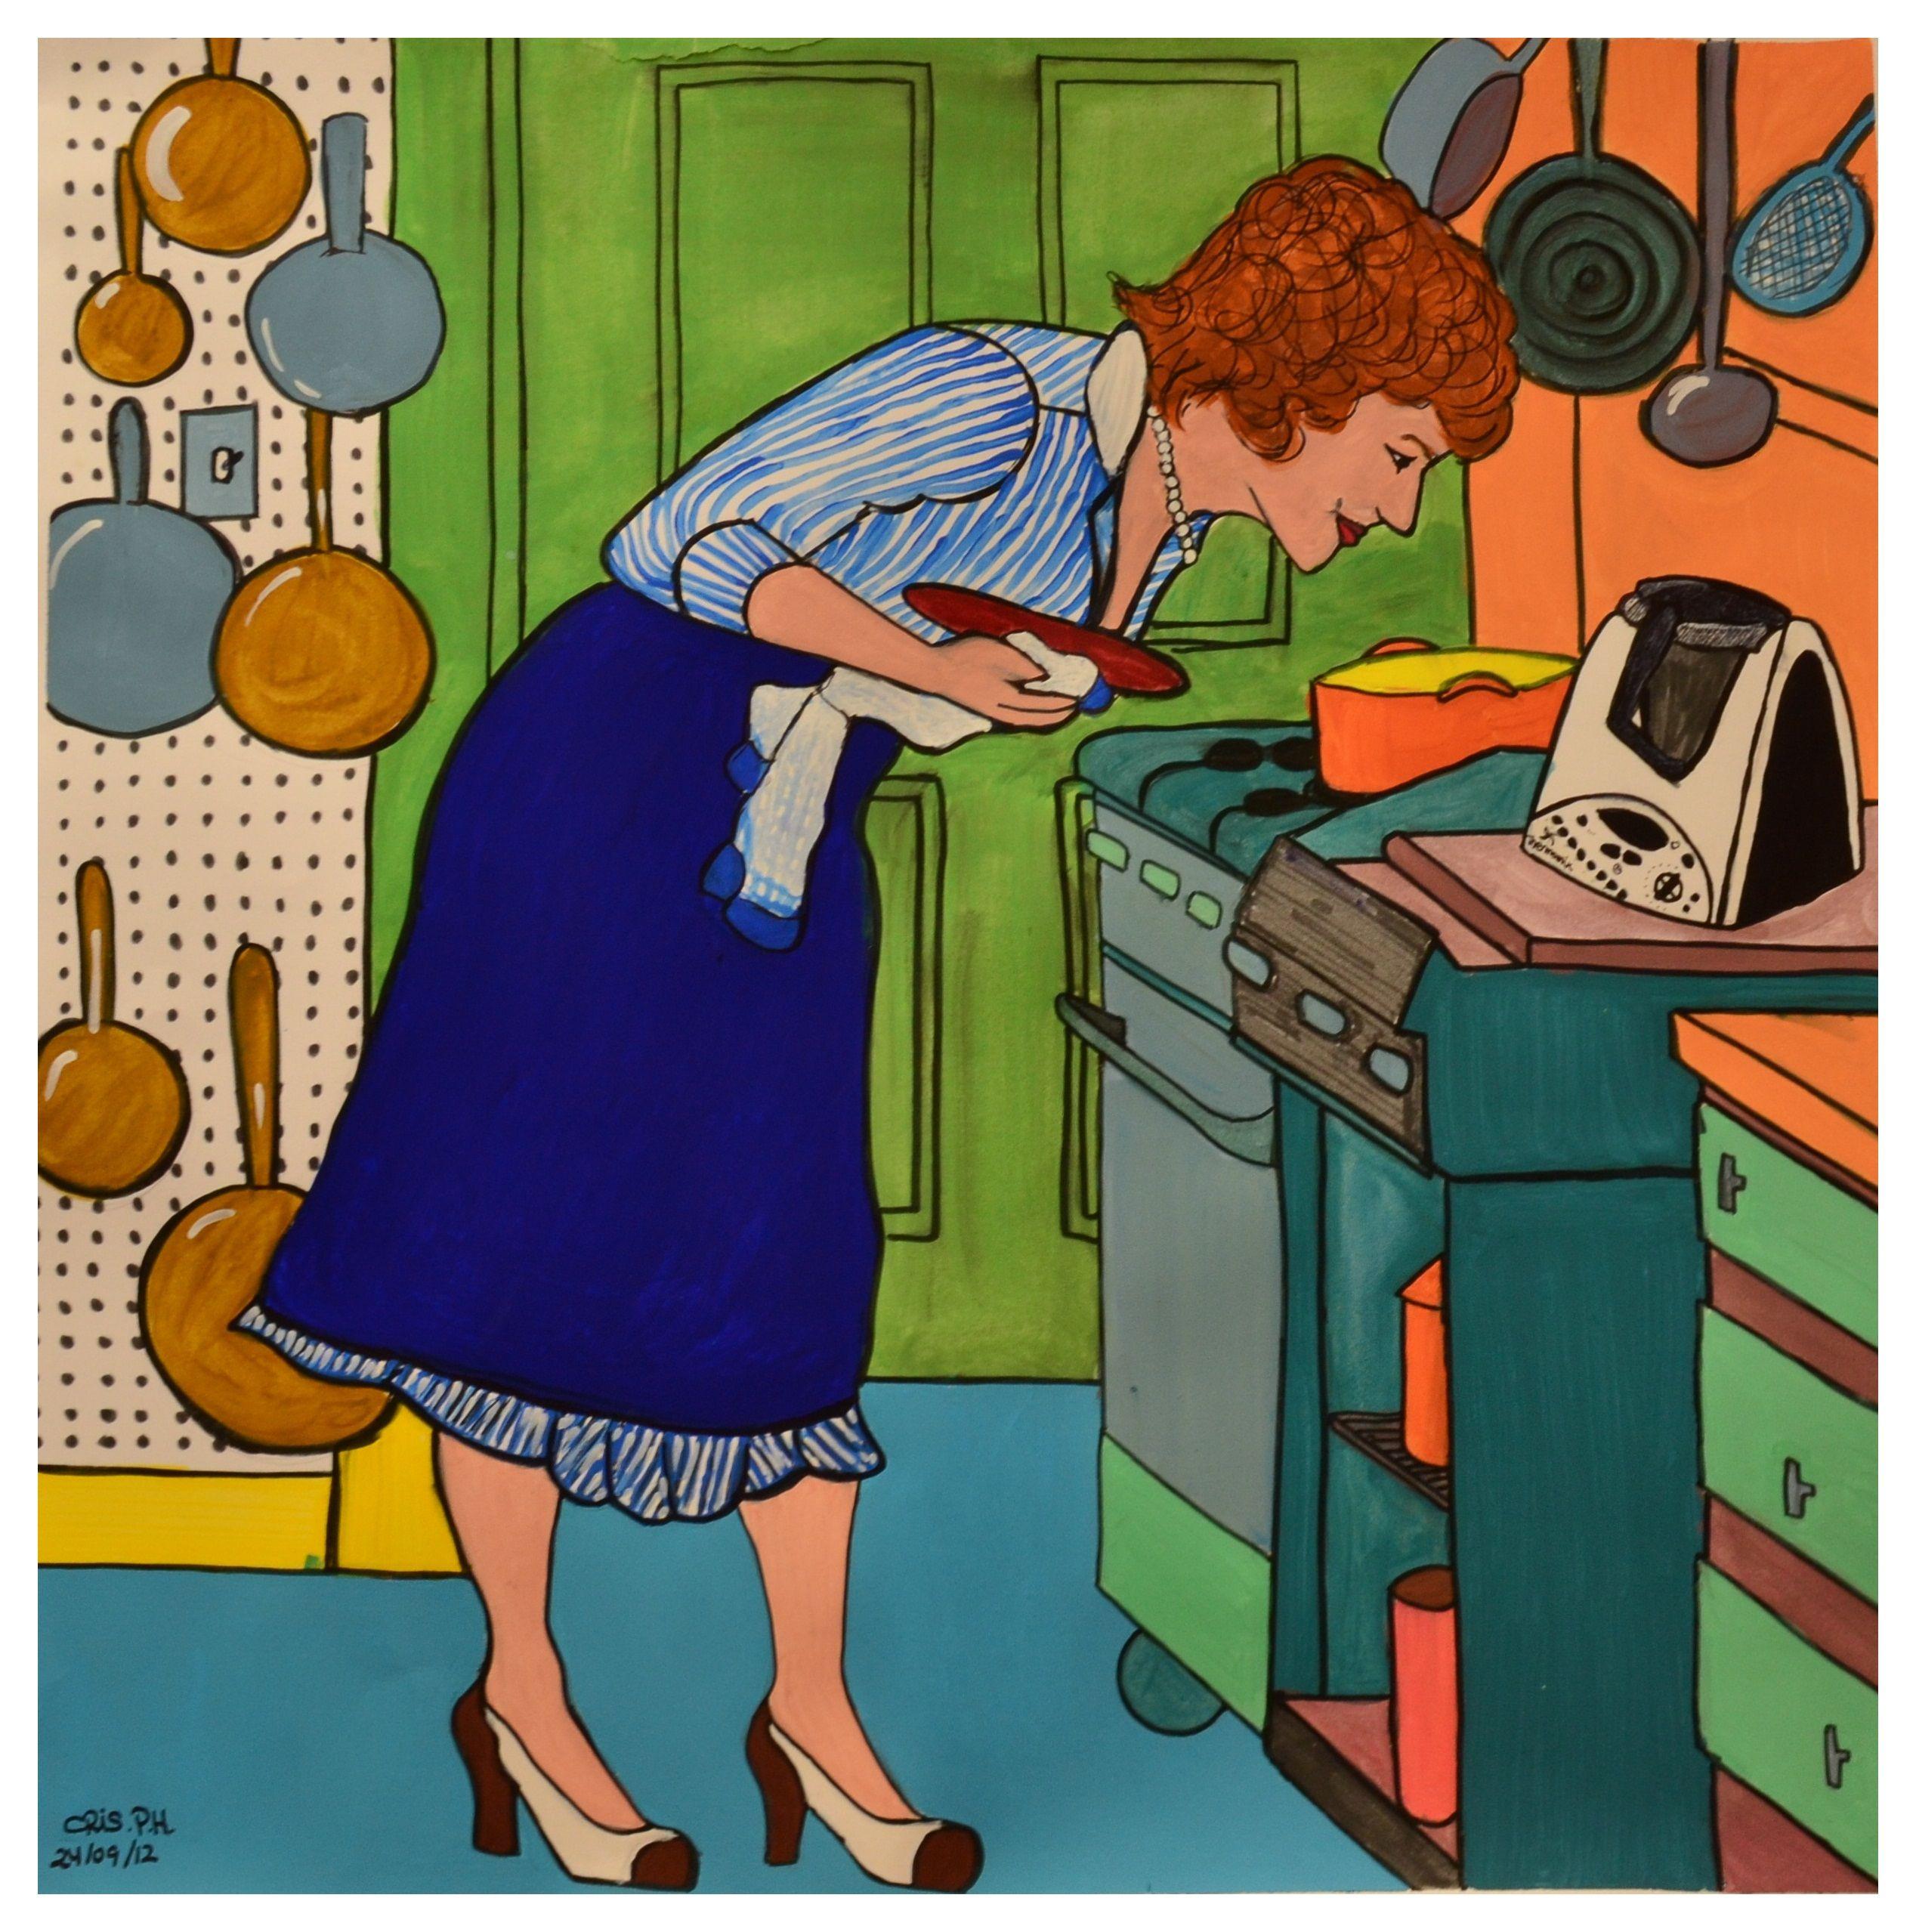 Cocinando (ilustración en temperas) #ilustration #acriliccolours #cooking #kitchen